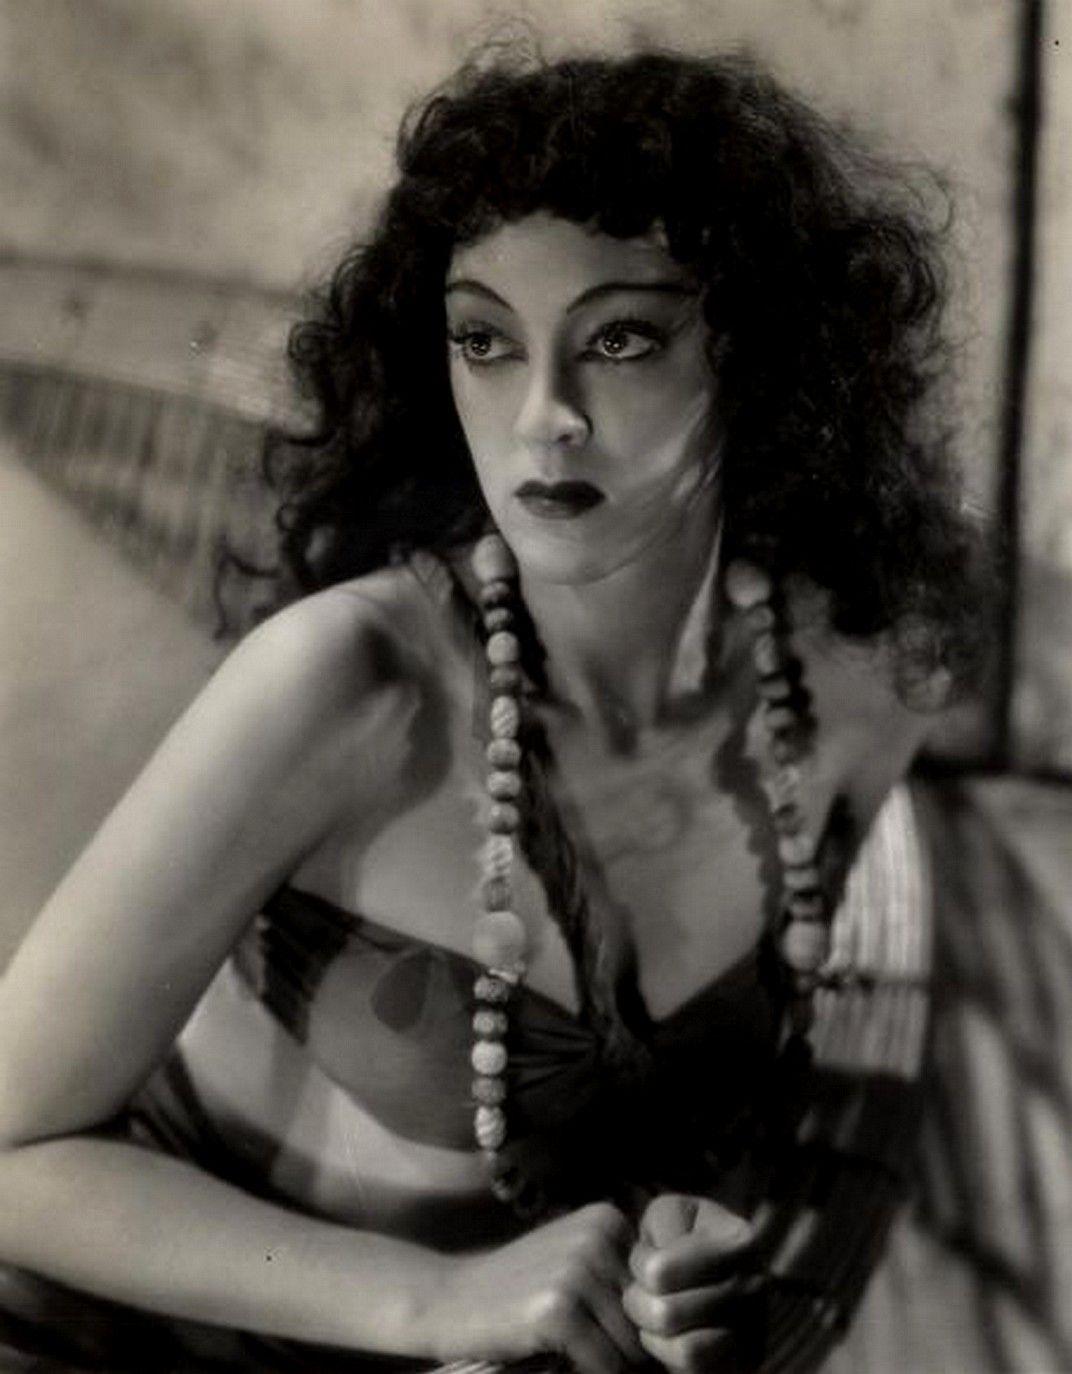 Helena Bonham Carter,Thalia Erotic videos Terry Farrell,Sushmita Sen